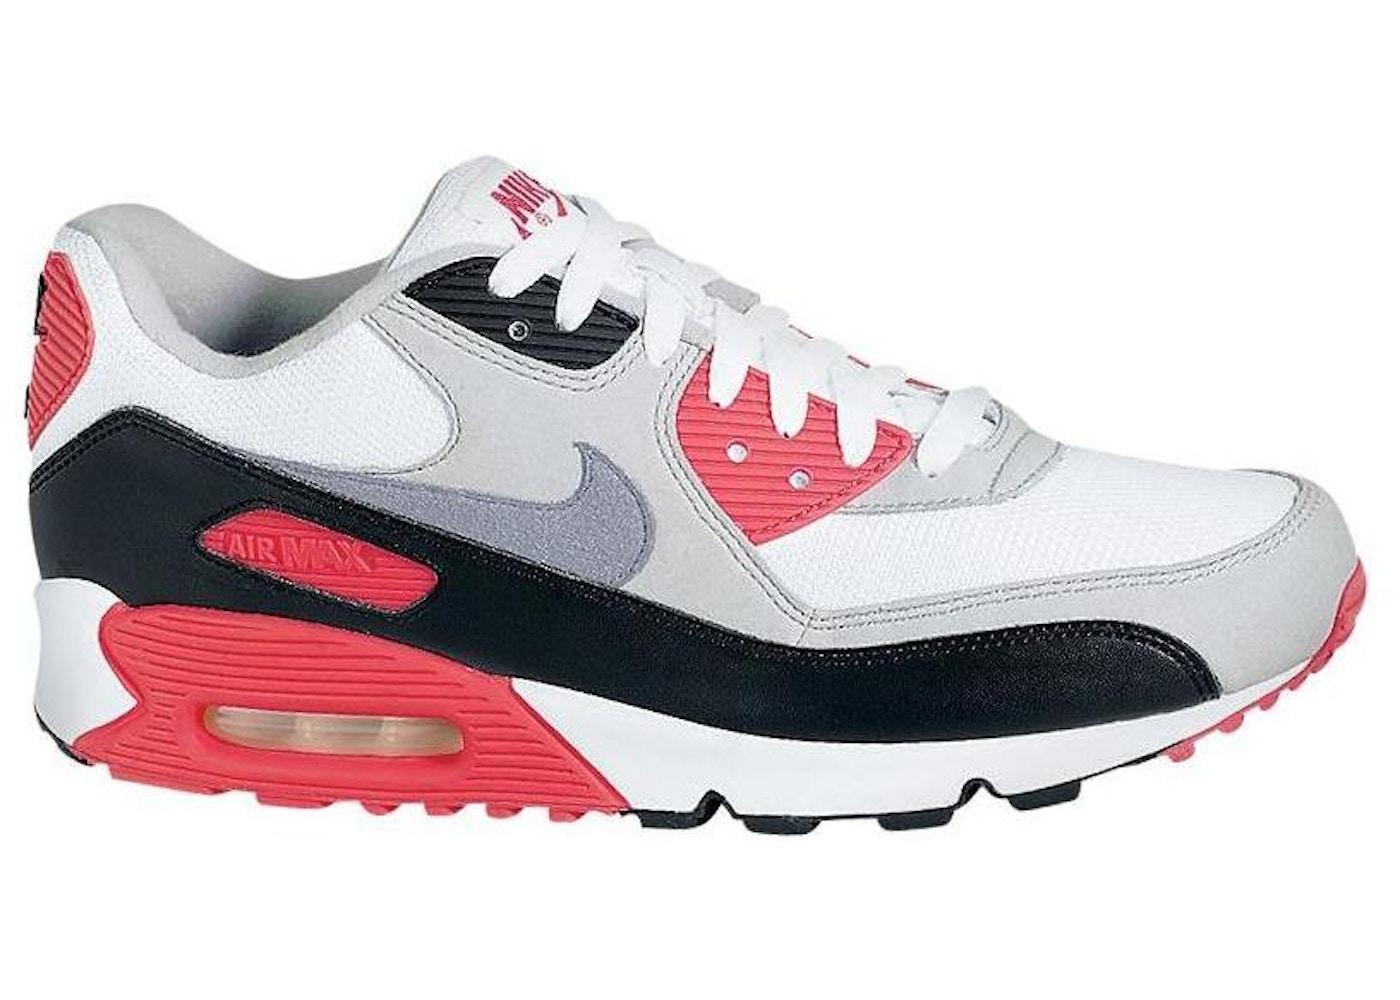 Uganda ayudante Duque  Nike Air Max 90 Infrared (2010) - 325018-107